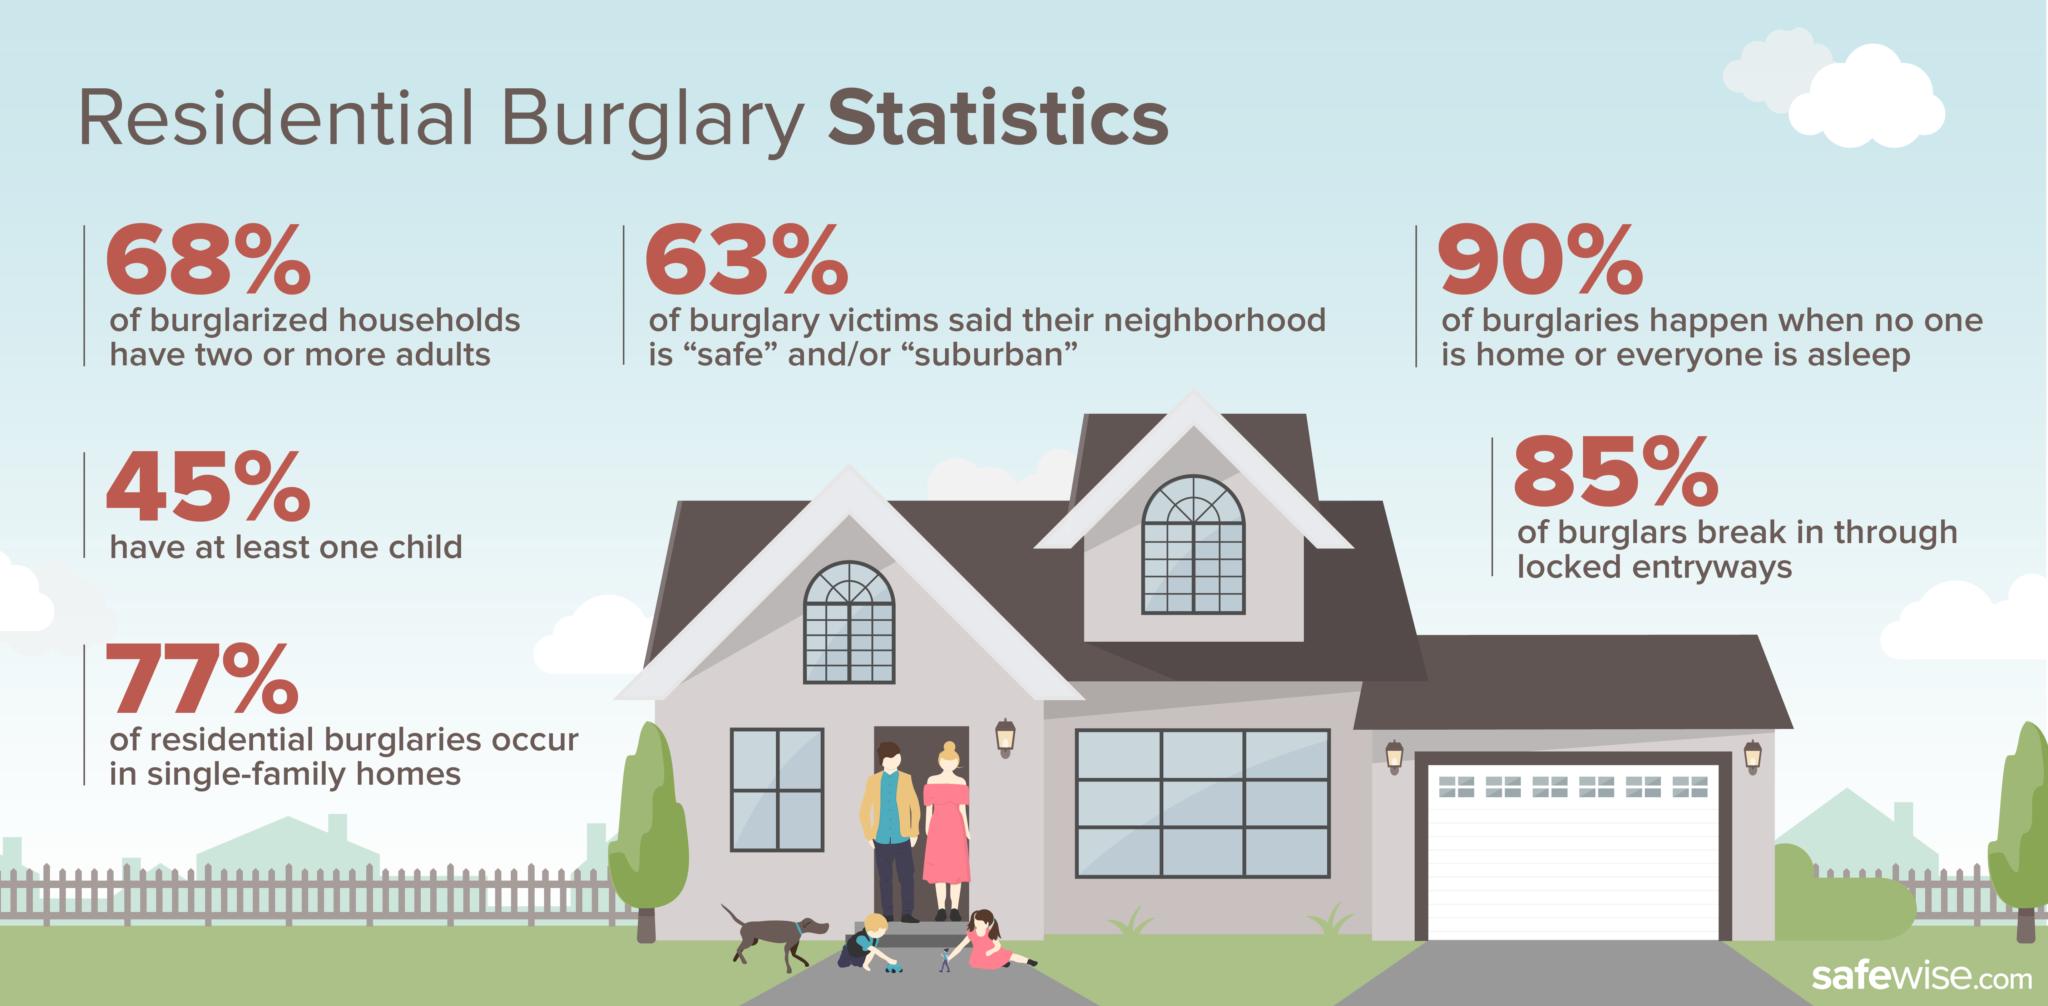 Residential Burglary Statistics Graphic